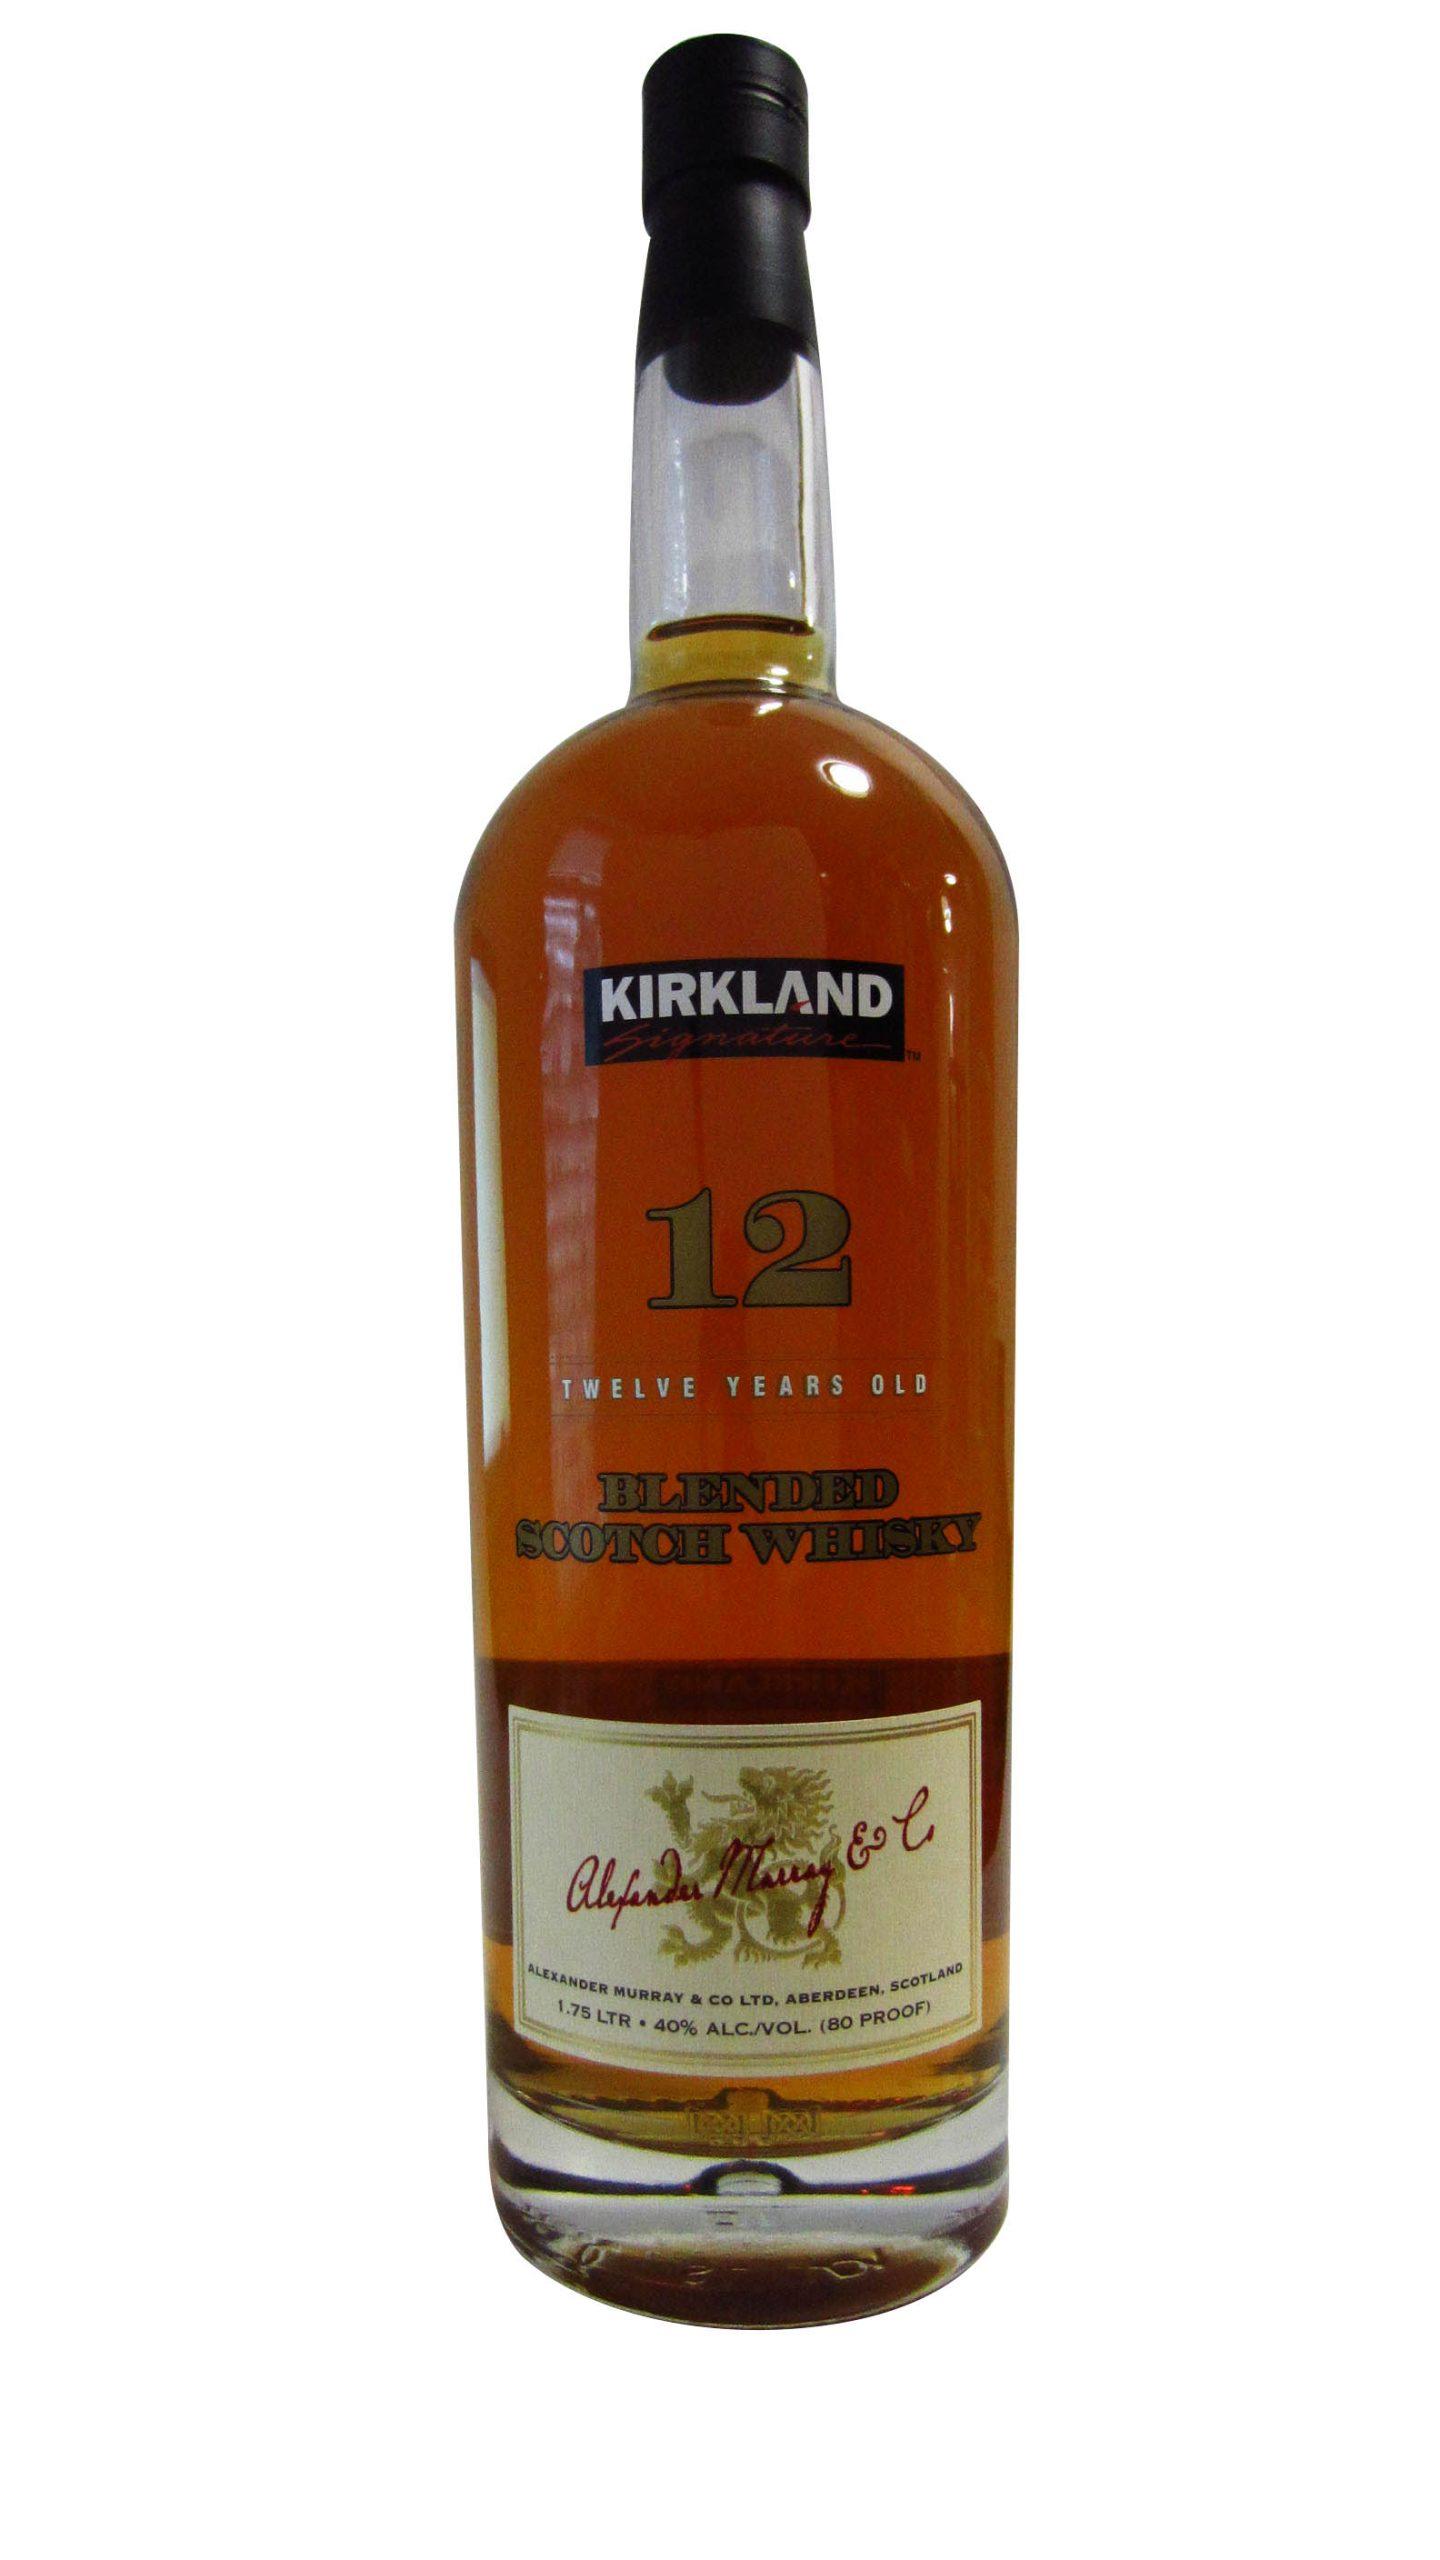 Kirkland Blended Scotch Whisky 12 Year Old